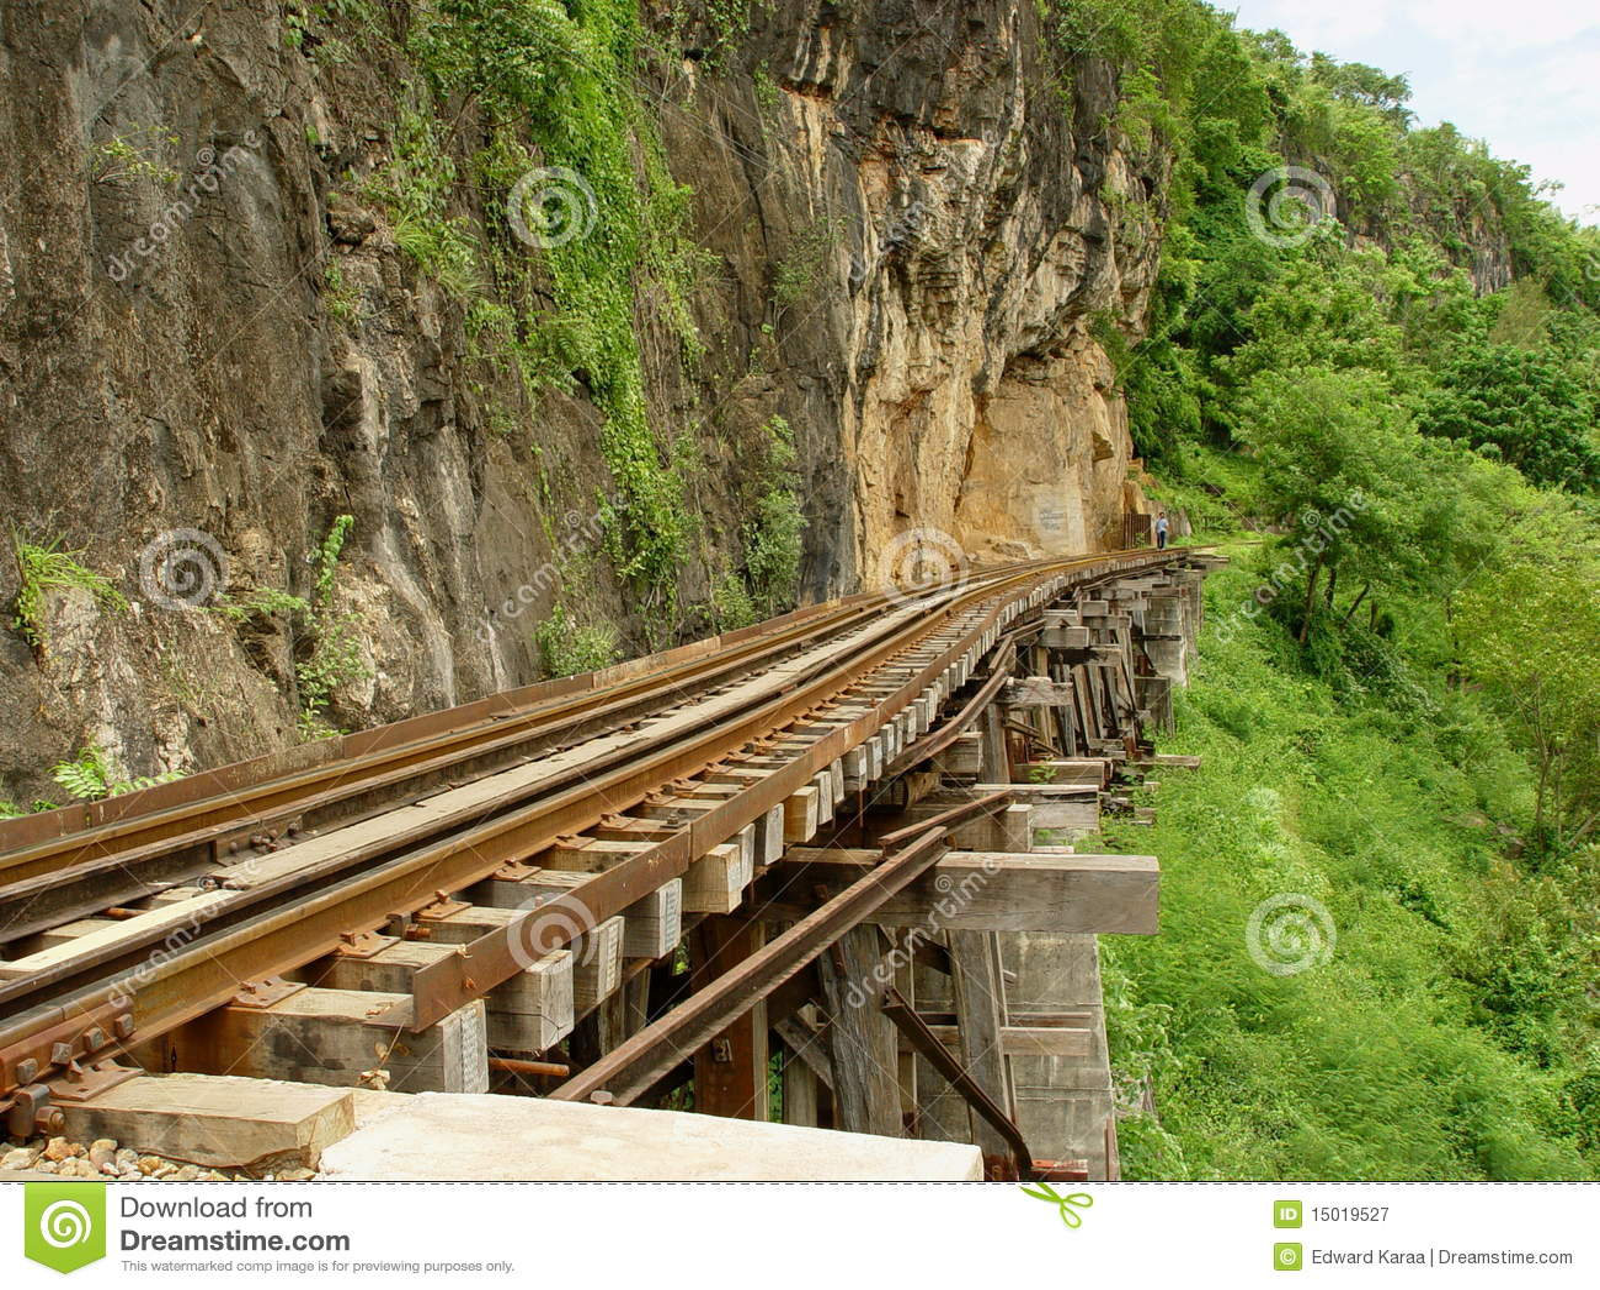 aka缅甸洞死亡臭名昭著的kanchanaburi krasae临近省铁路残余泰国.